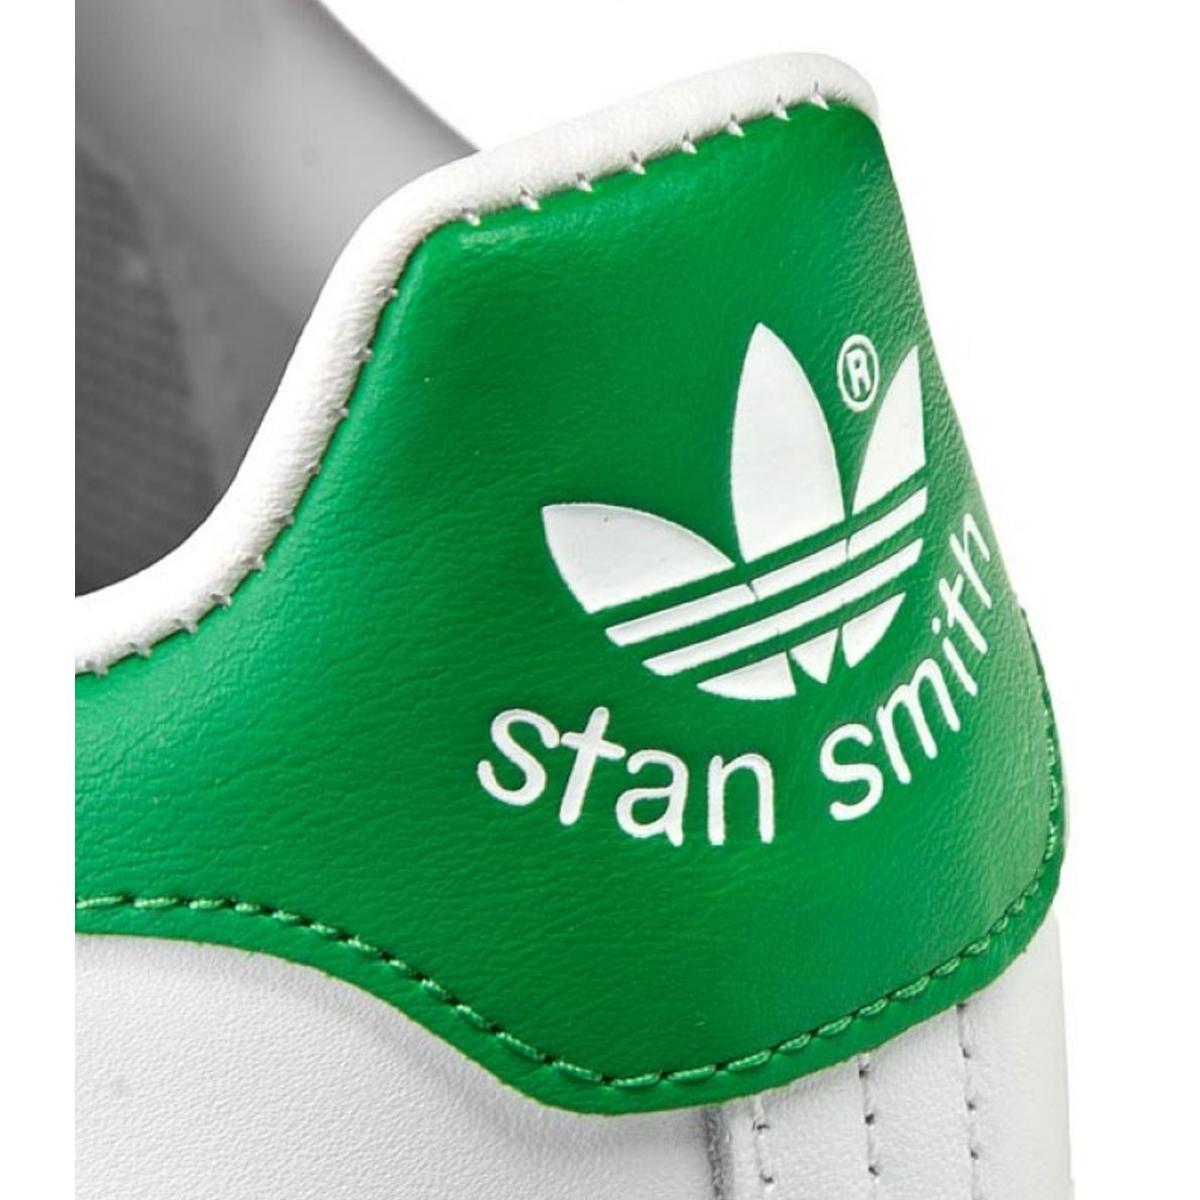 Scarpe Stan Smith Adidas da uomo bianco/verde rif.M20324